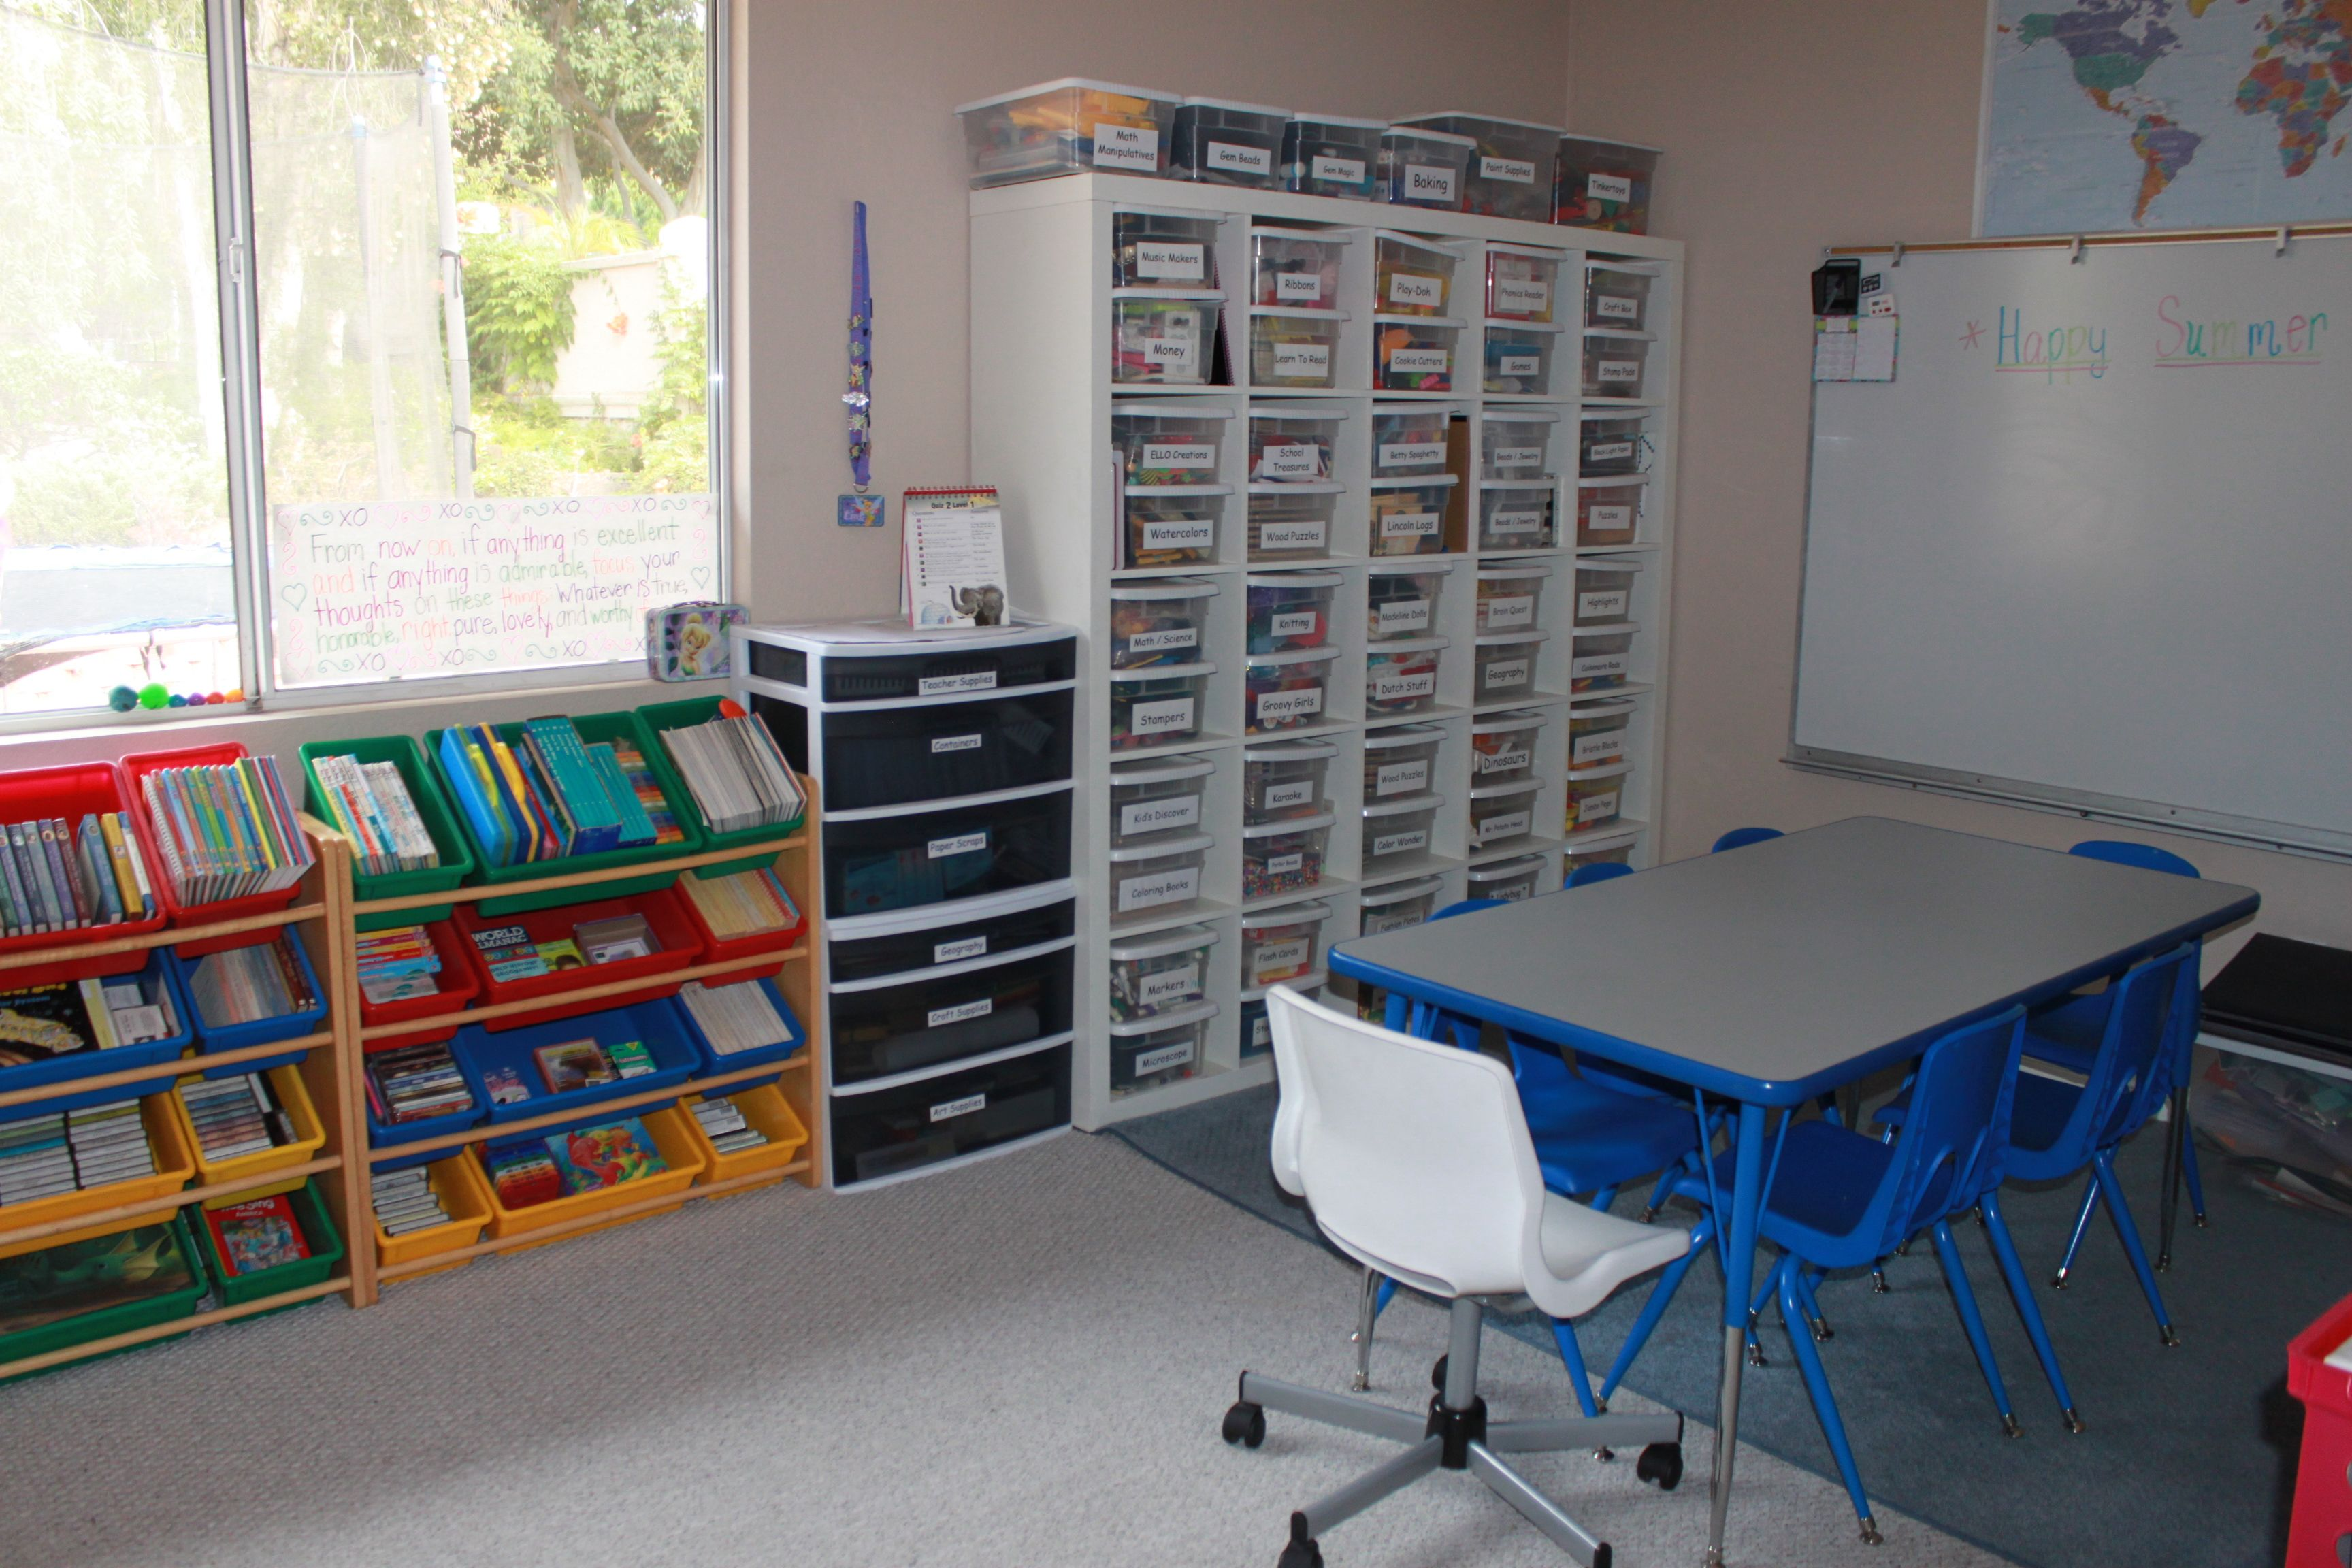 My sister's organized homeschool room. @Michele Morales Morales Morales Morales Gaeta